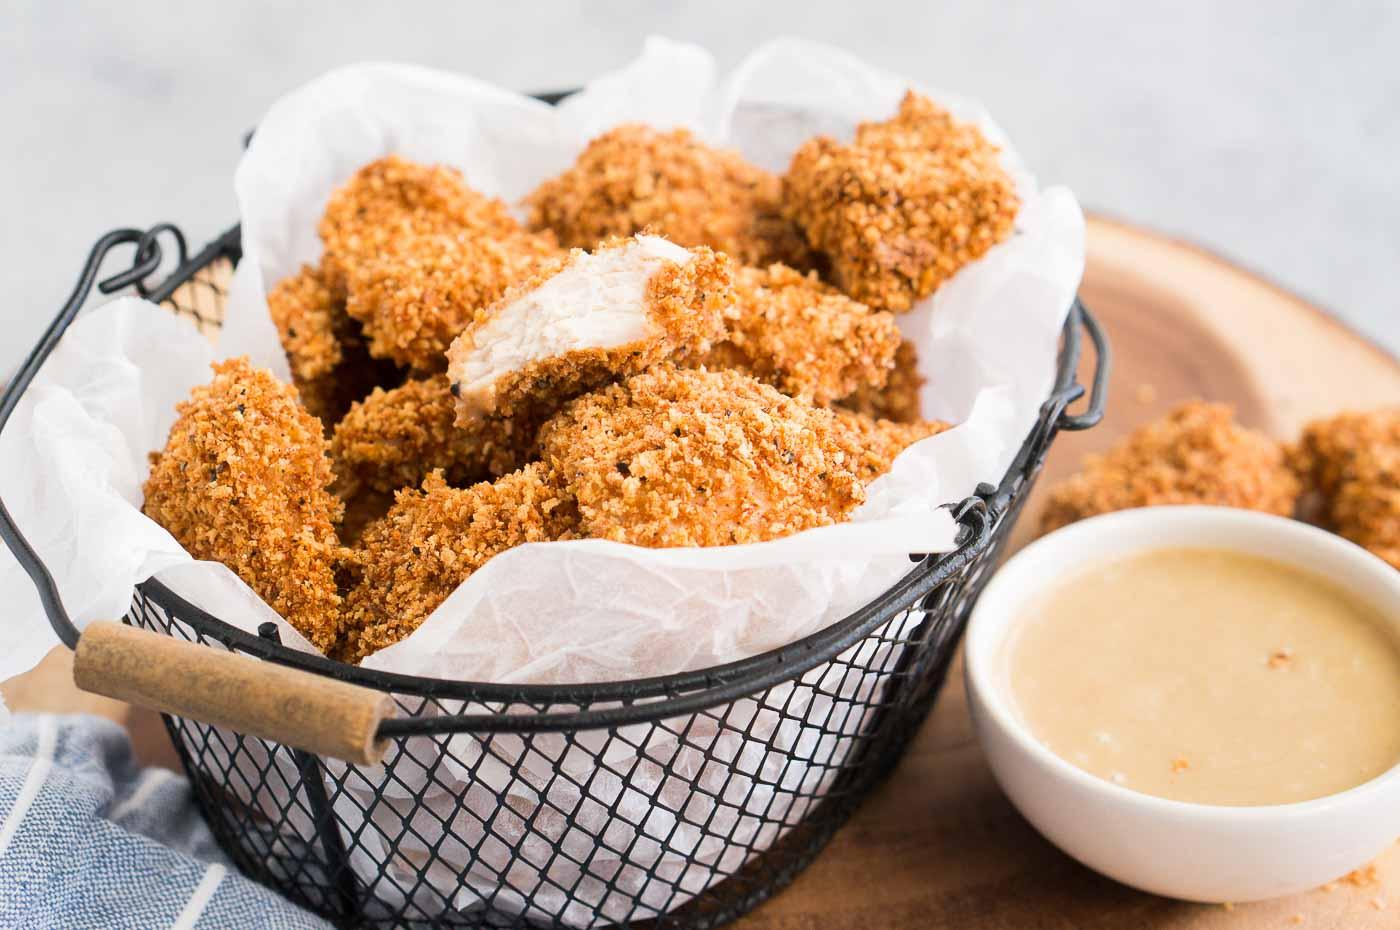 tender and crispy chicken bites in a basket